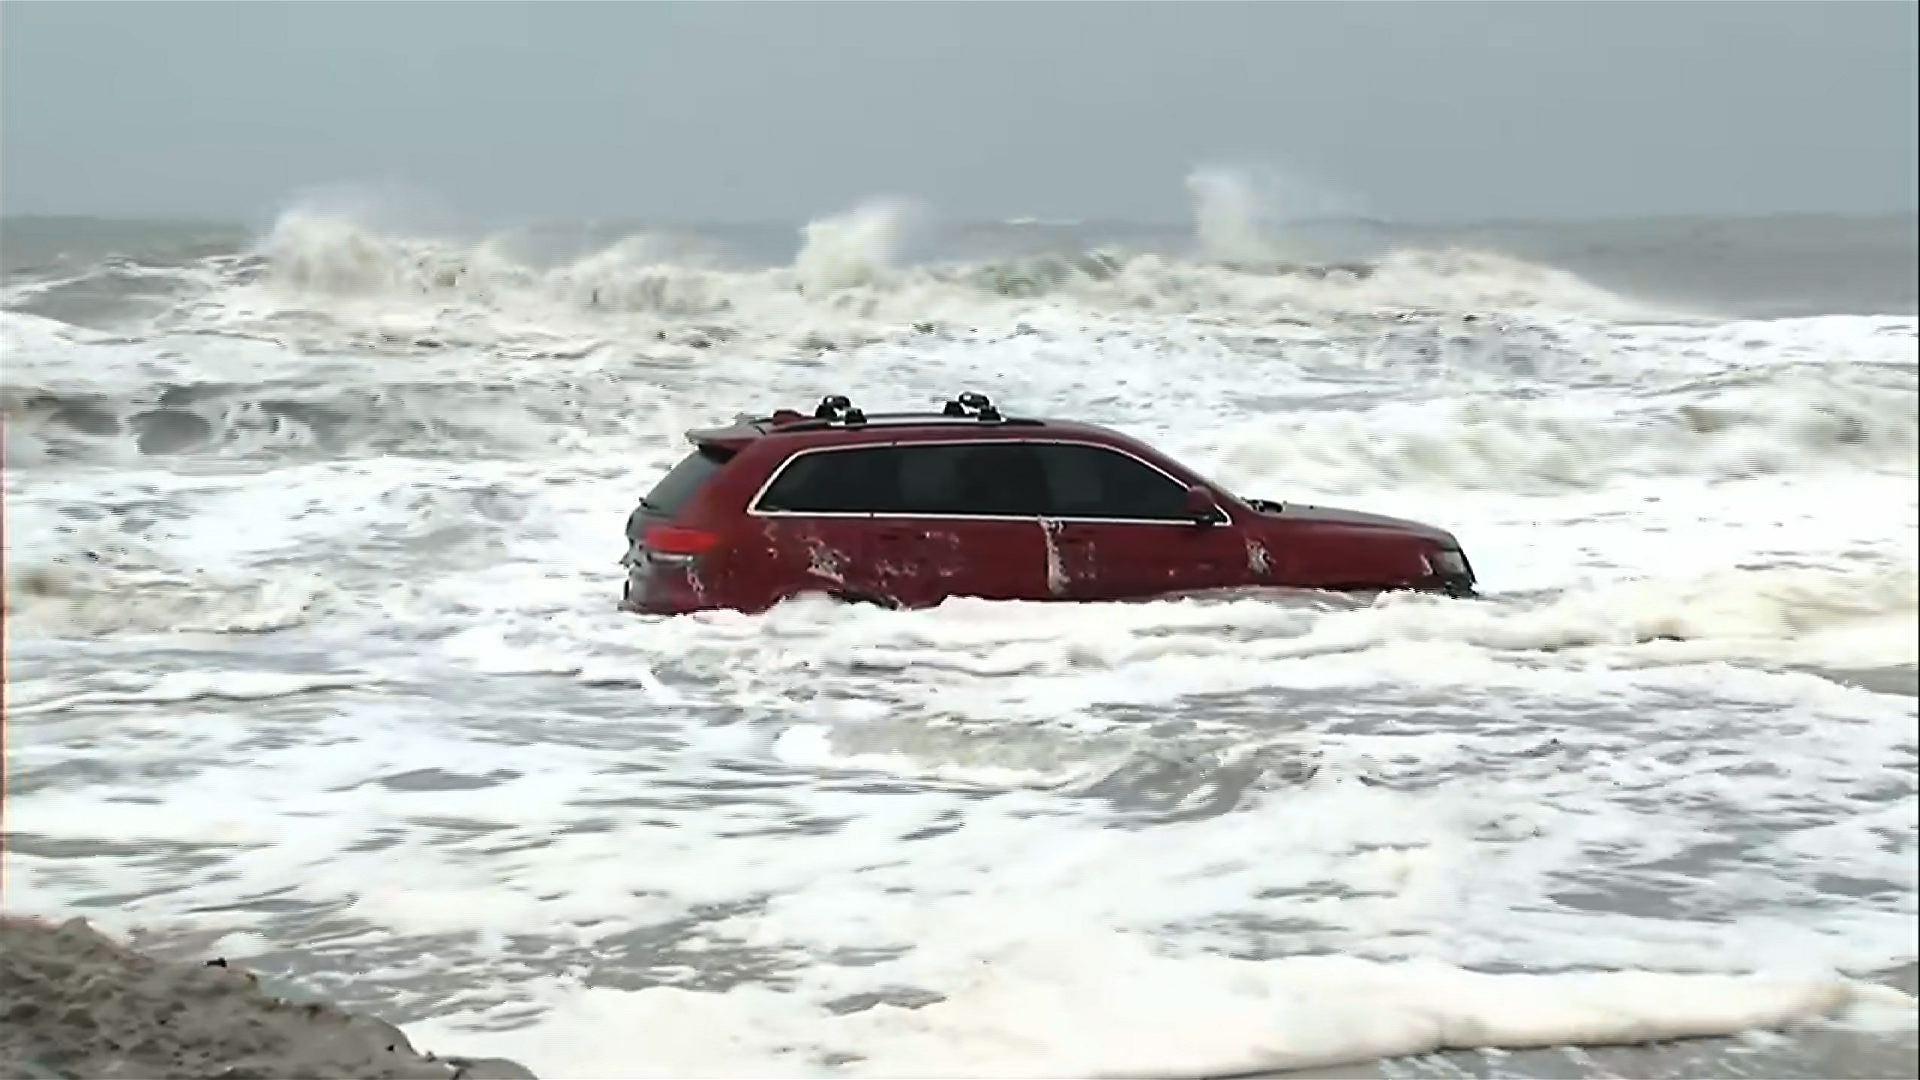 Car stuck in storm waves as Dorian nears S.C.